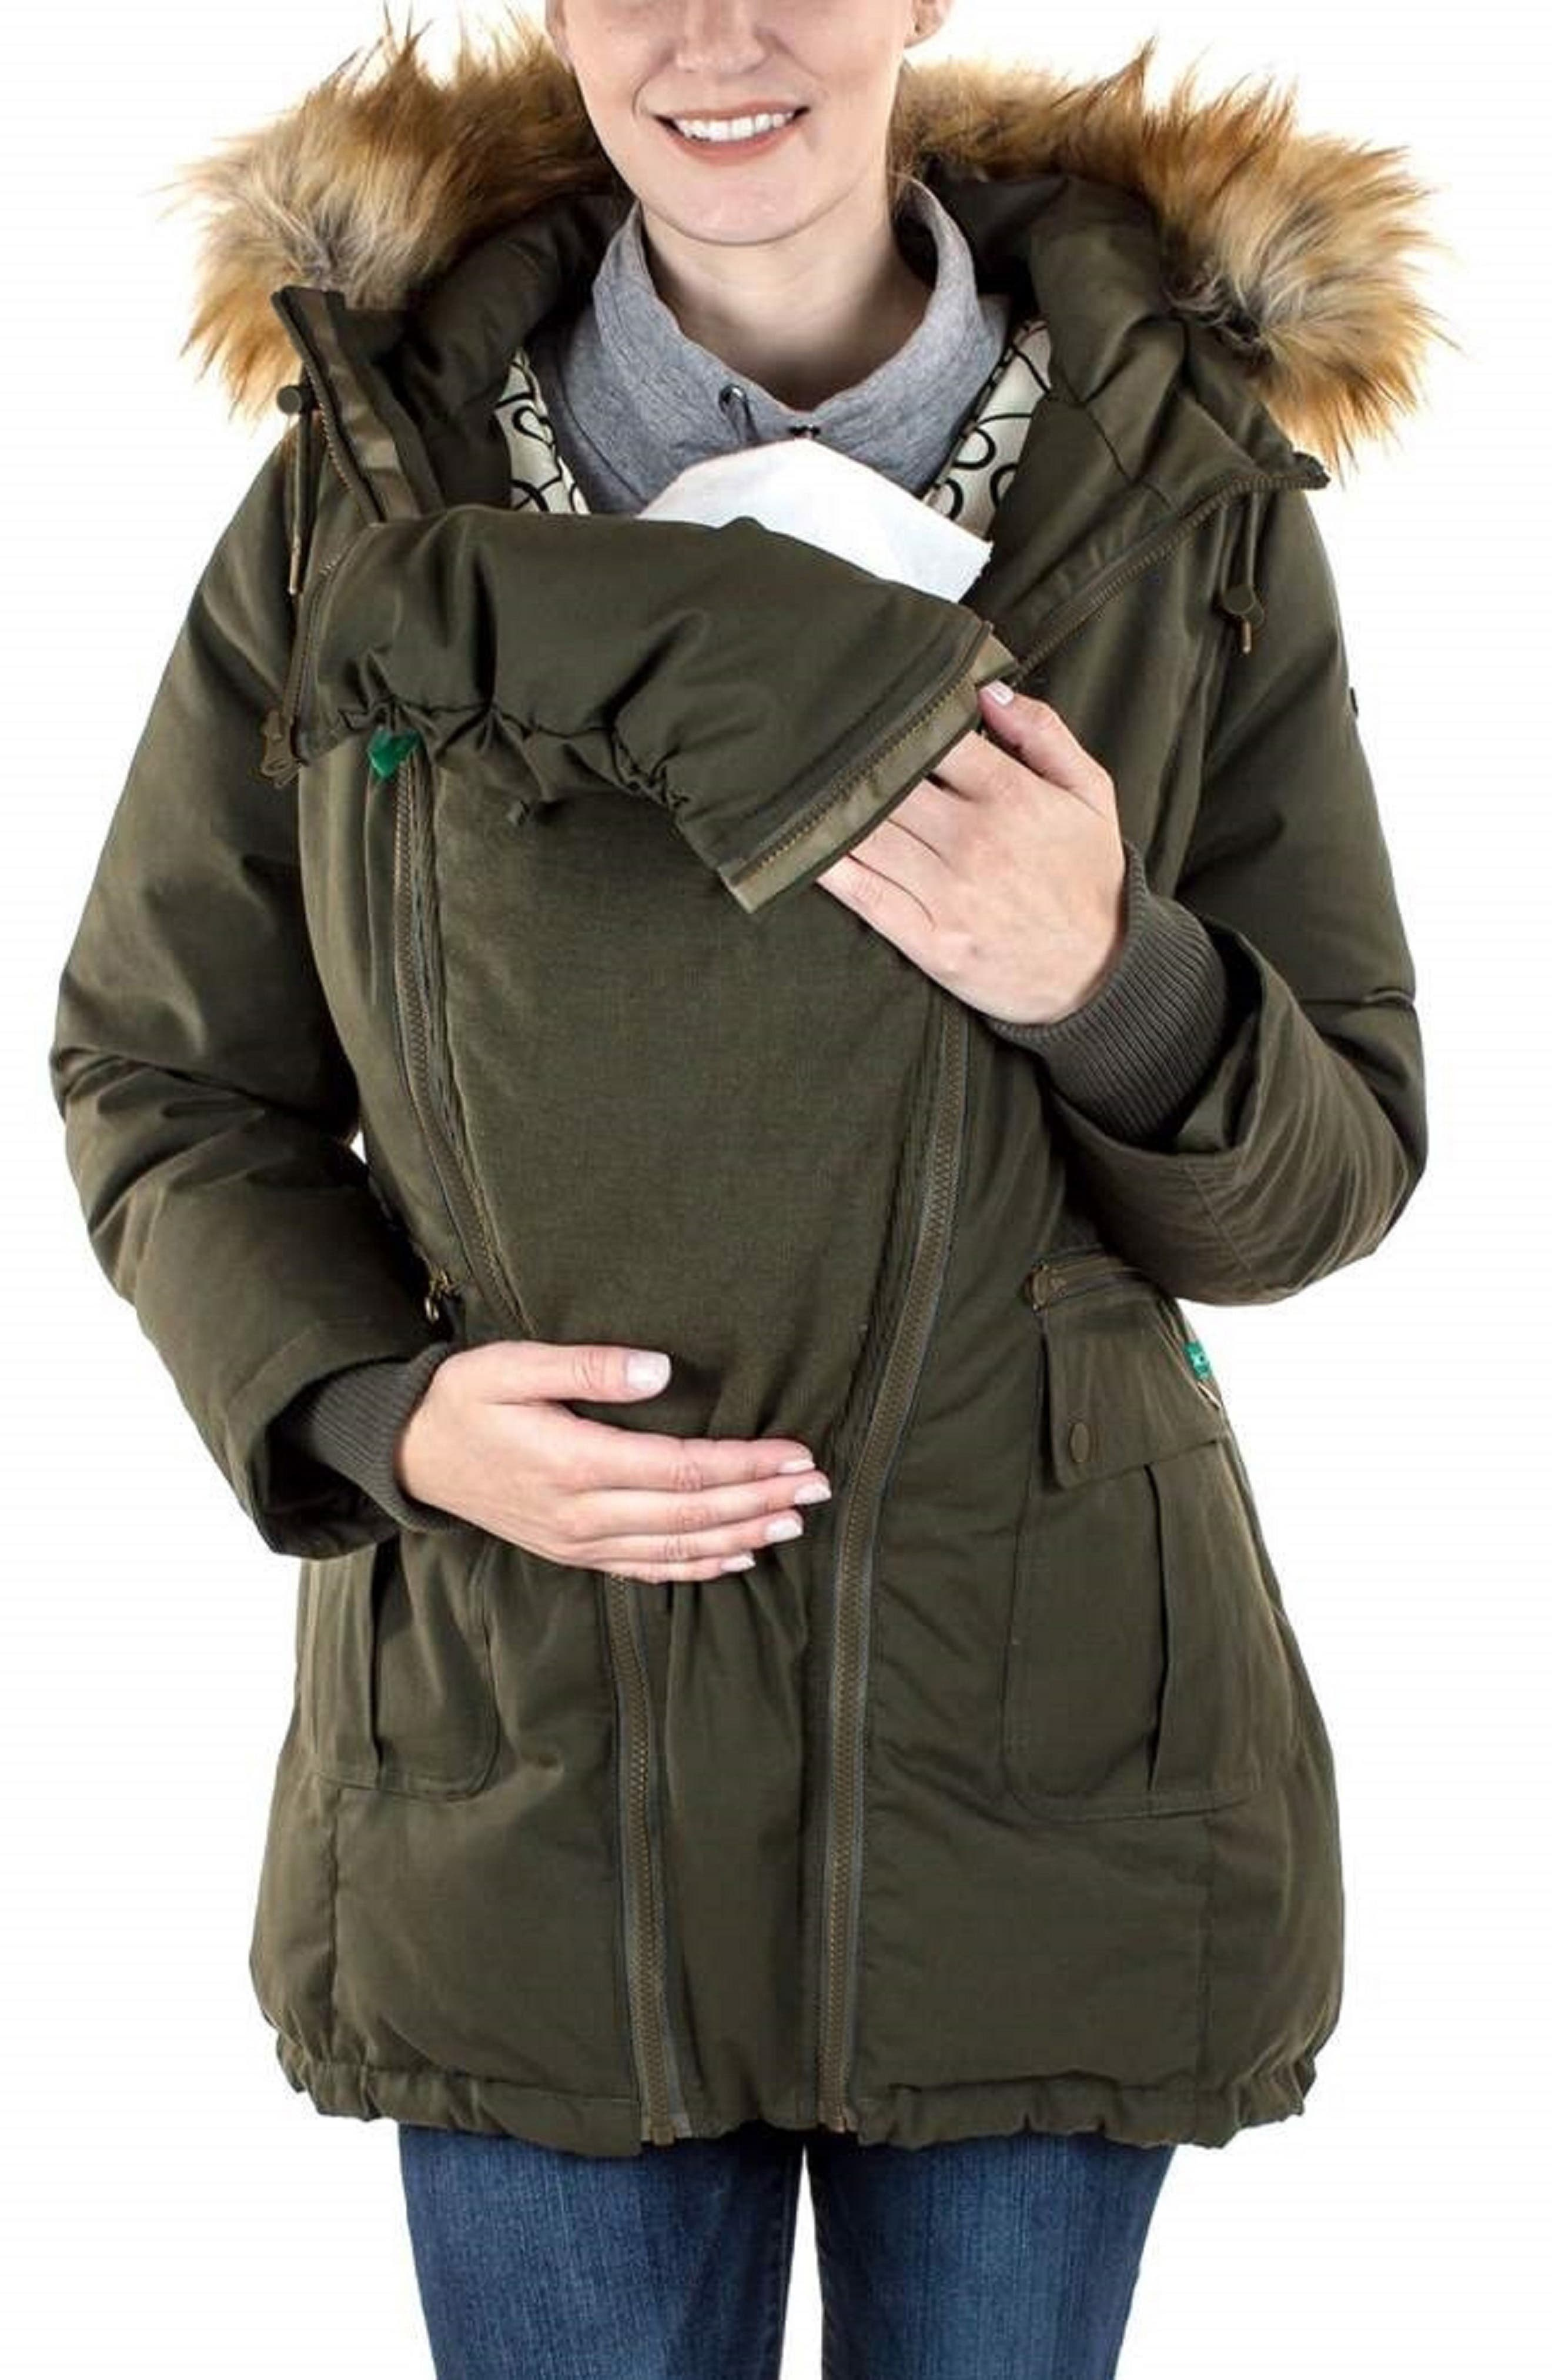 Convertible Down 3-in-1 Maternity Jacket,                             Alternate thumbnail 2, color,                             KHAKI GREEN